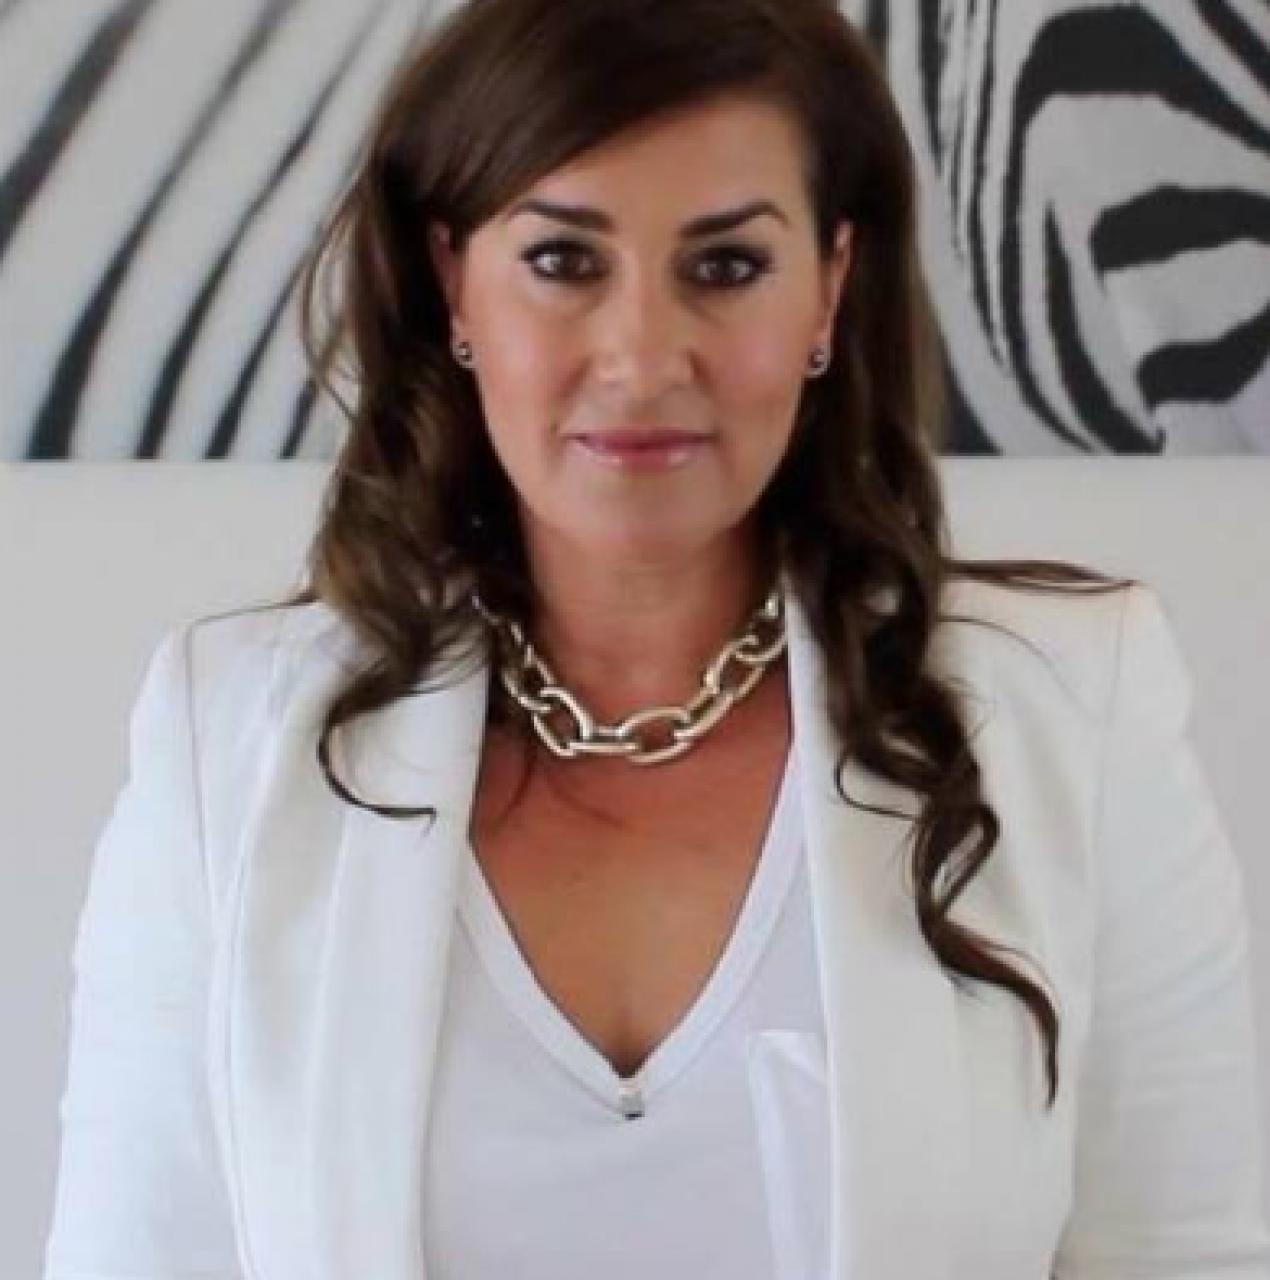 Annette Lackovic